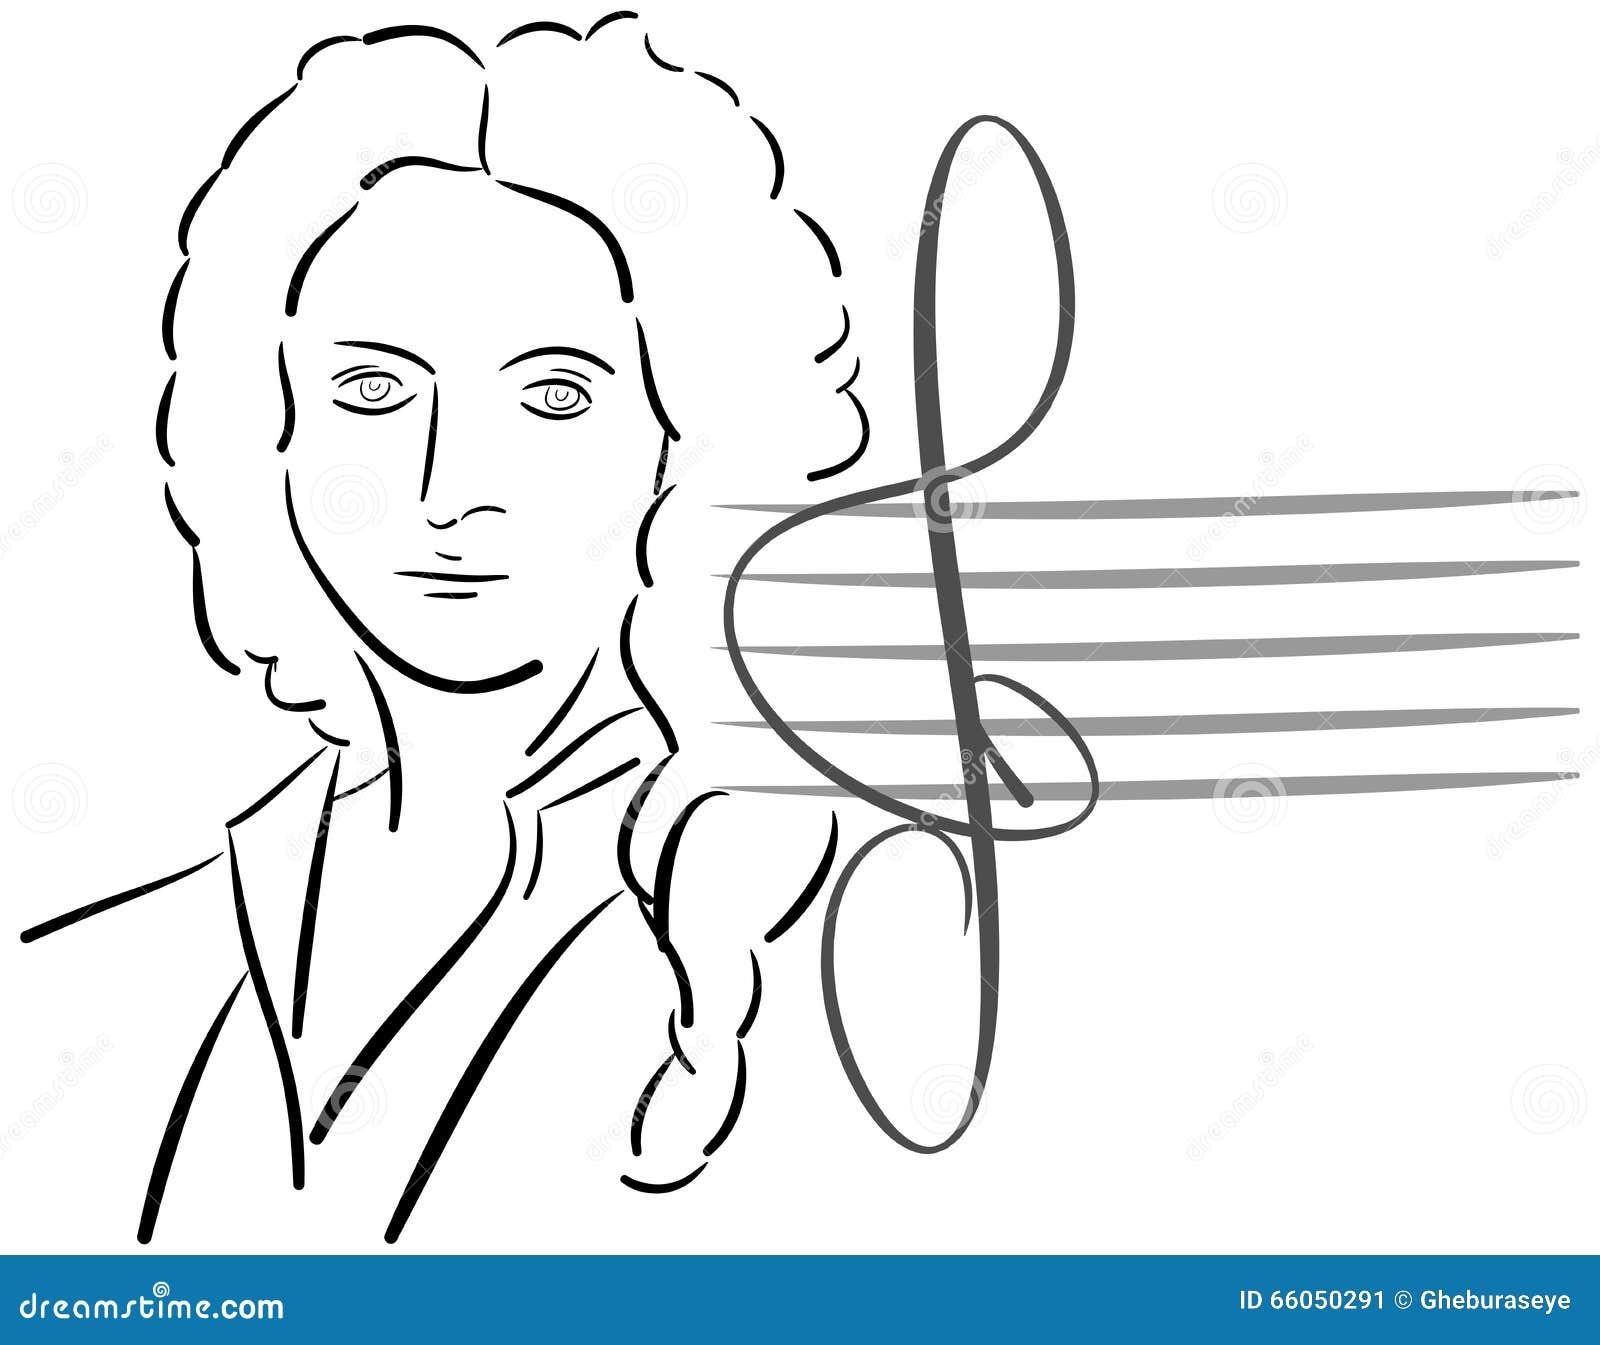 Image Result For Royalty Free Music Vivaldi